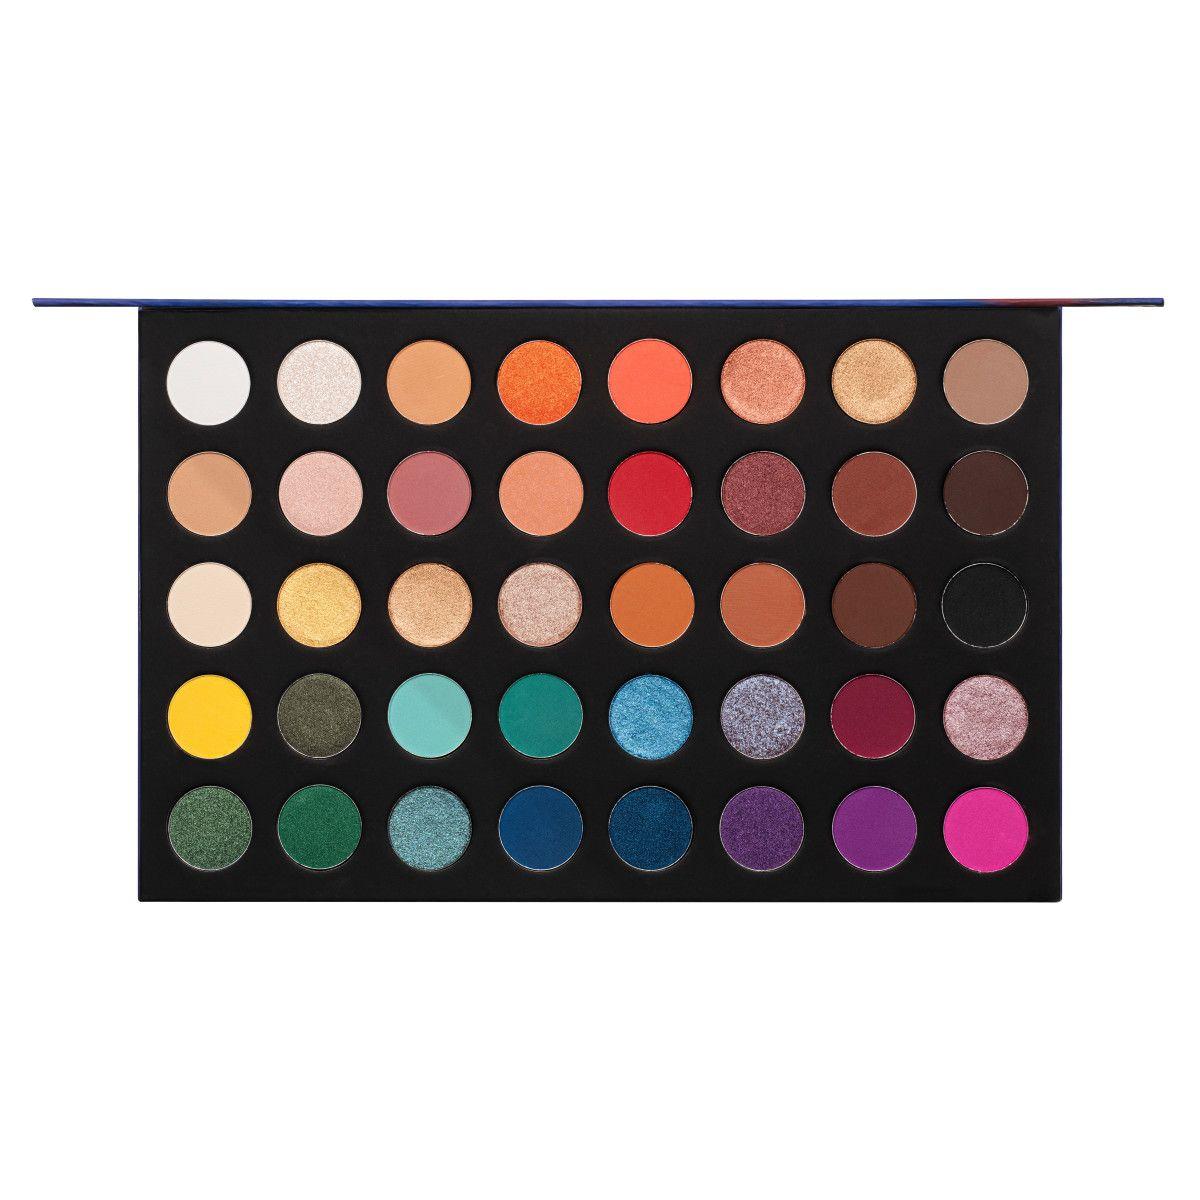 Wet N Wild The 40 Eyeshadow Palette